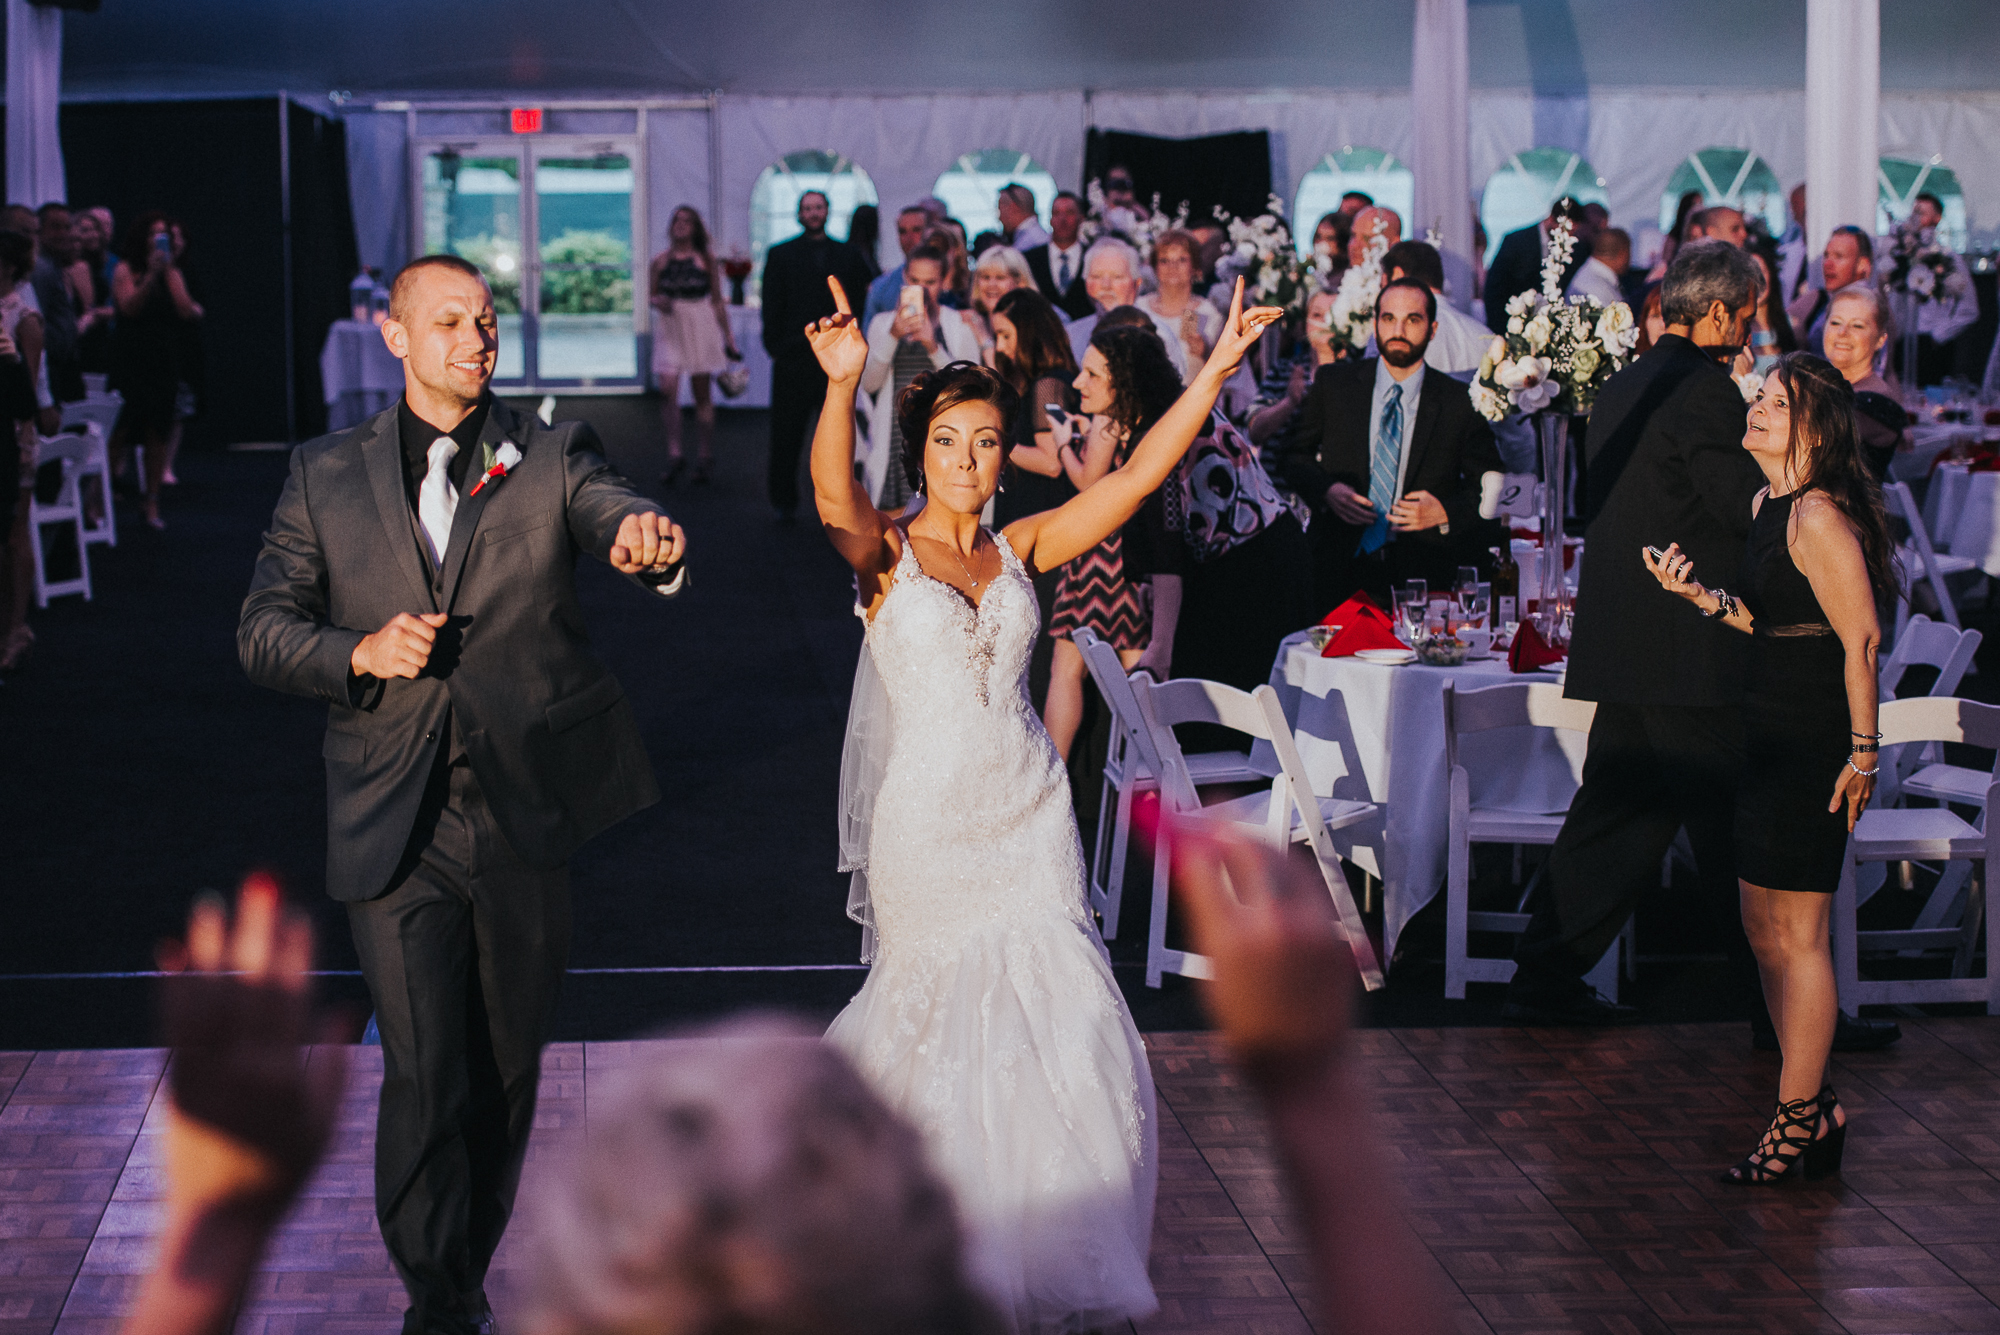 Christina-and-Gene-Wedding-Marla-Rain-Photography-468.jpg